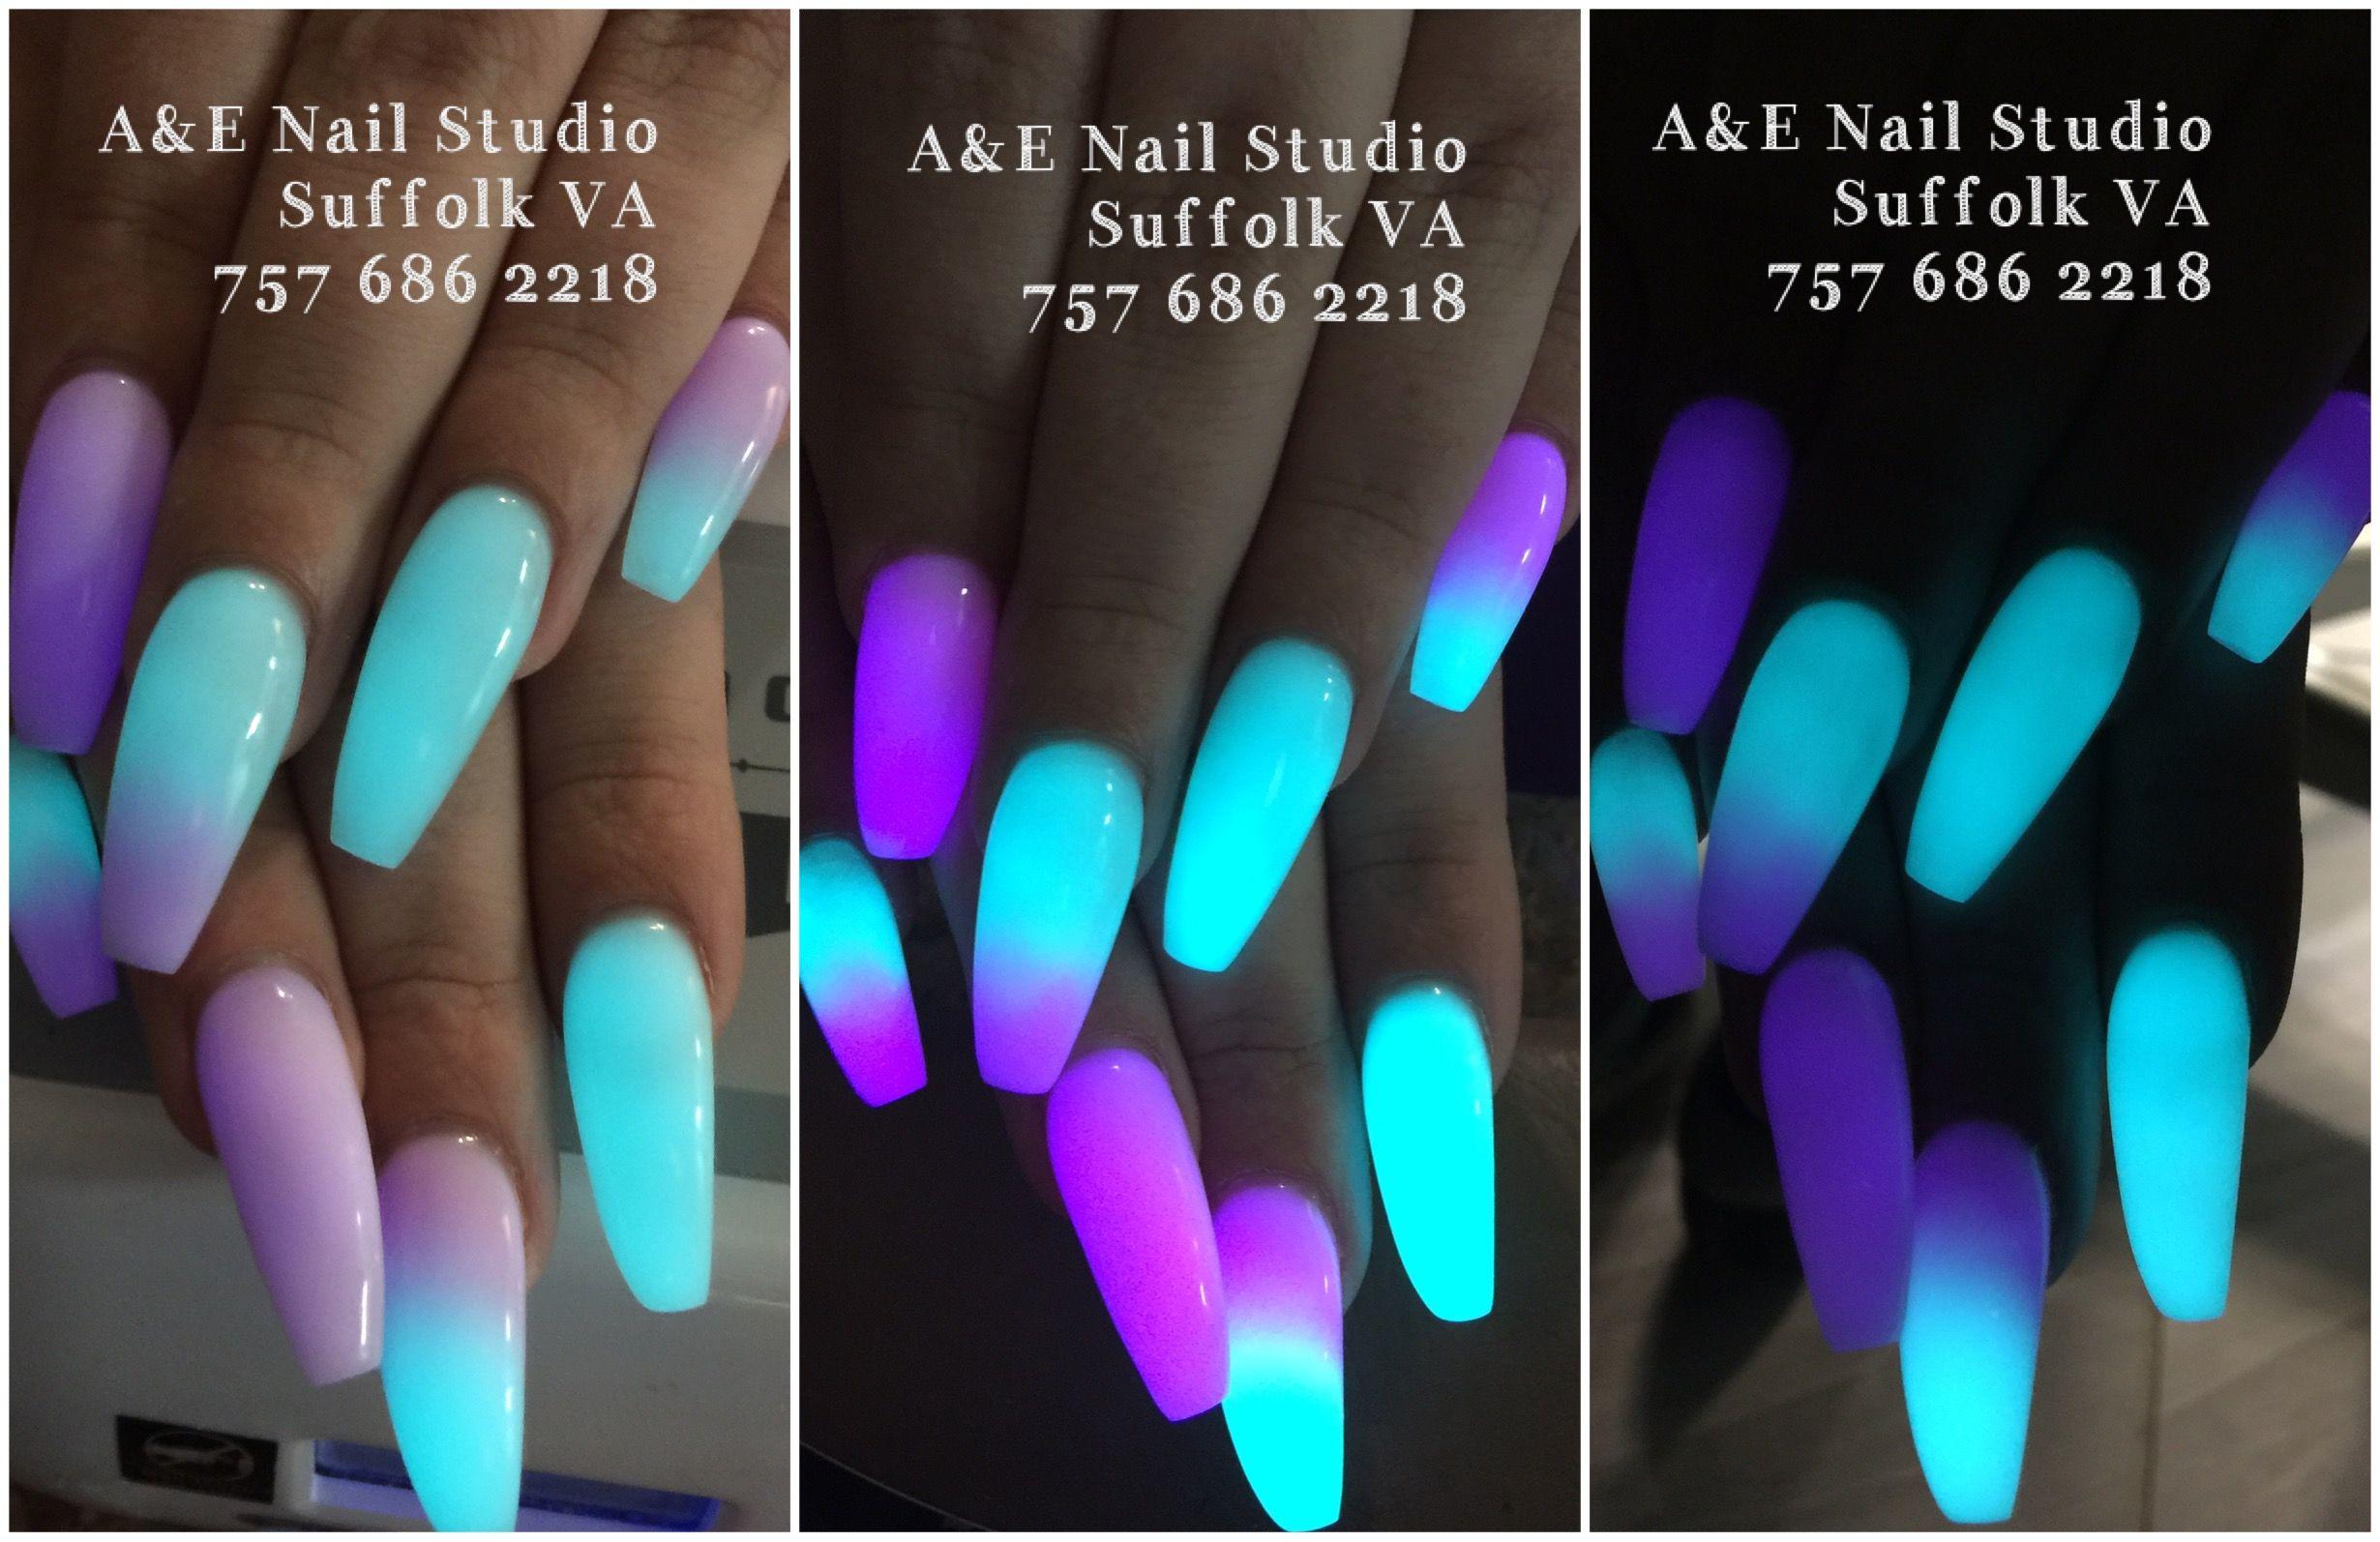 Glow In The Dark Nails Powder Fuchsia And Aqua Ombre Nails Glow Nails Rave Nails Neon Nails